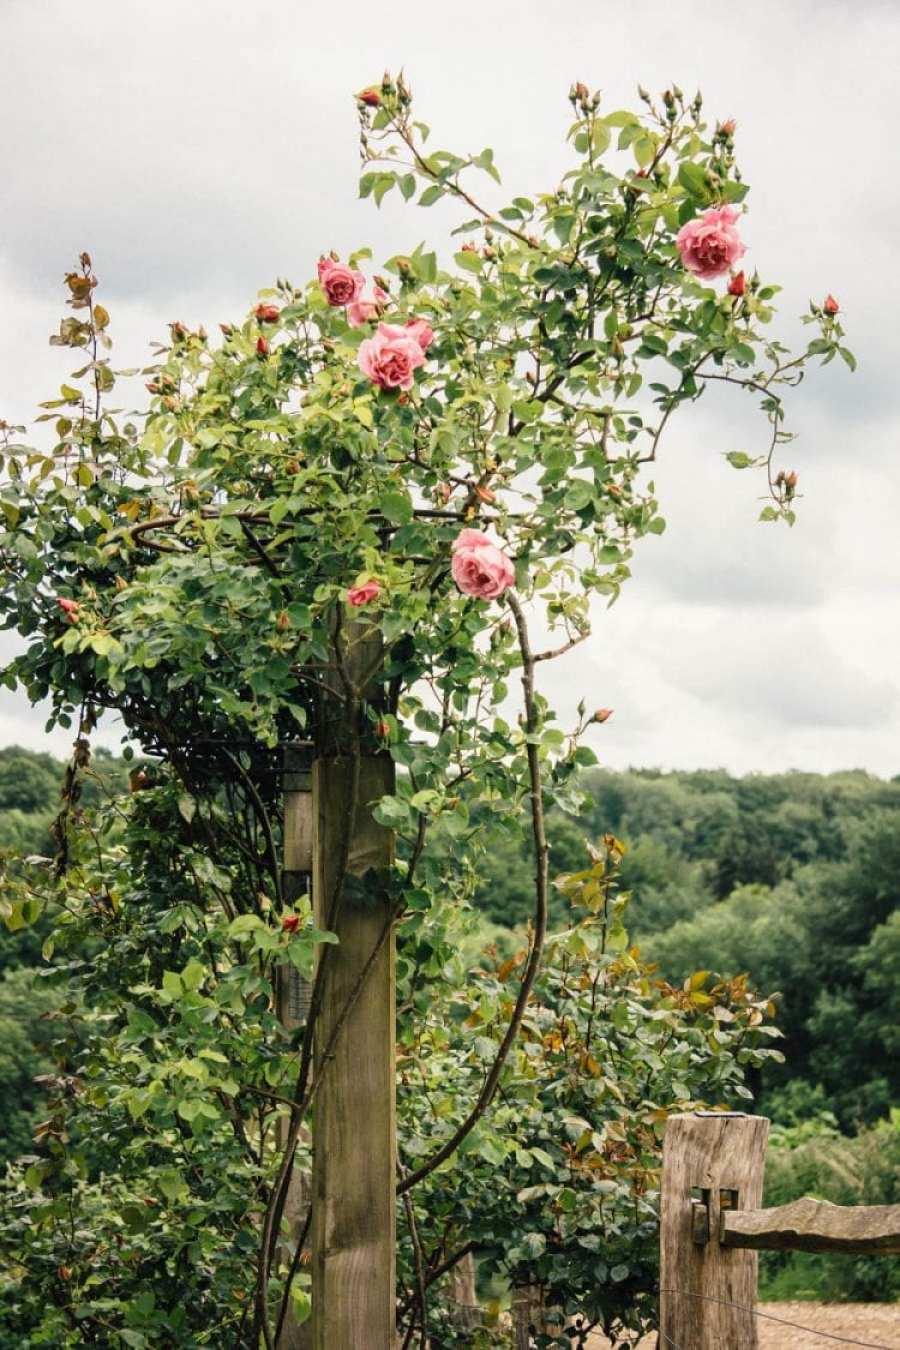 Climbing rose on wood pillar